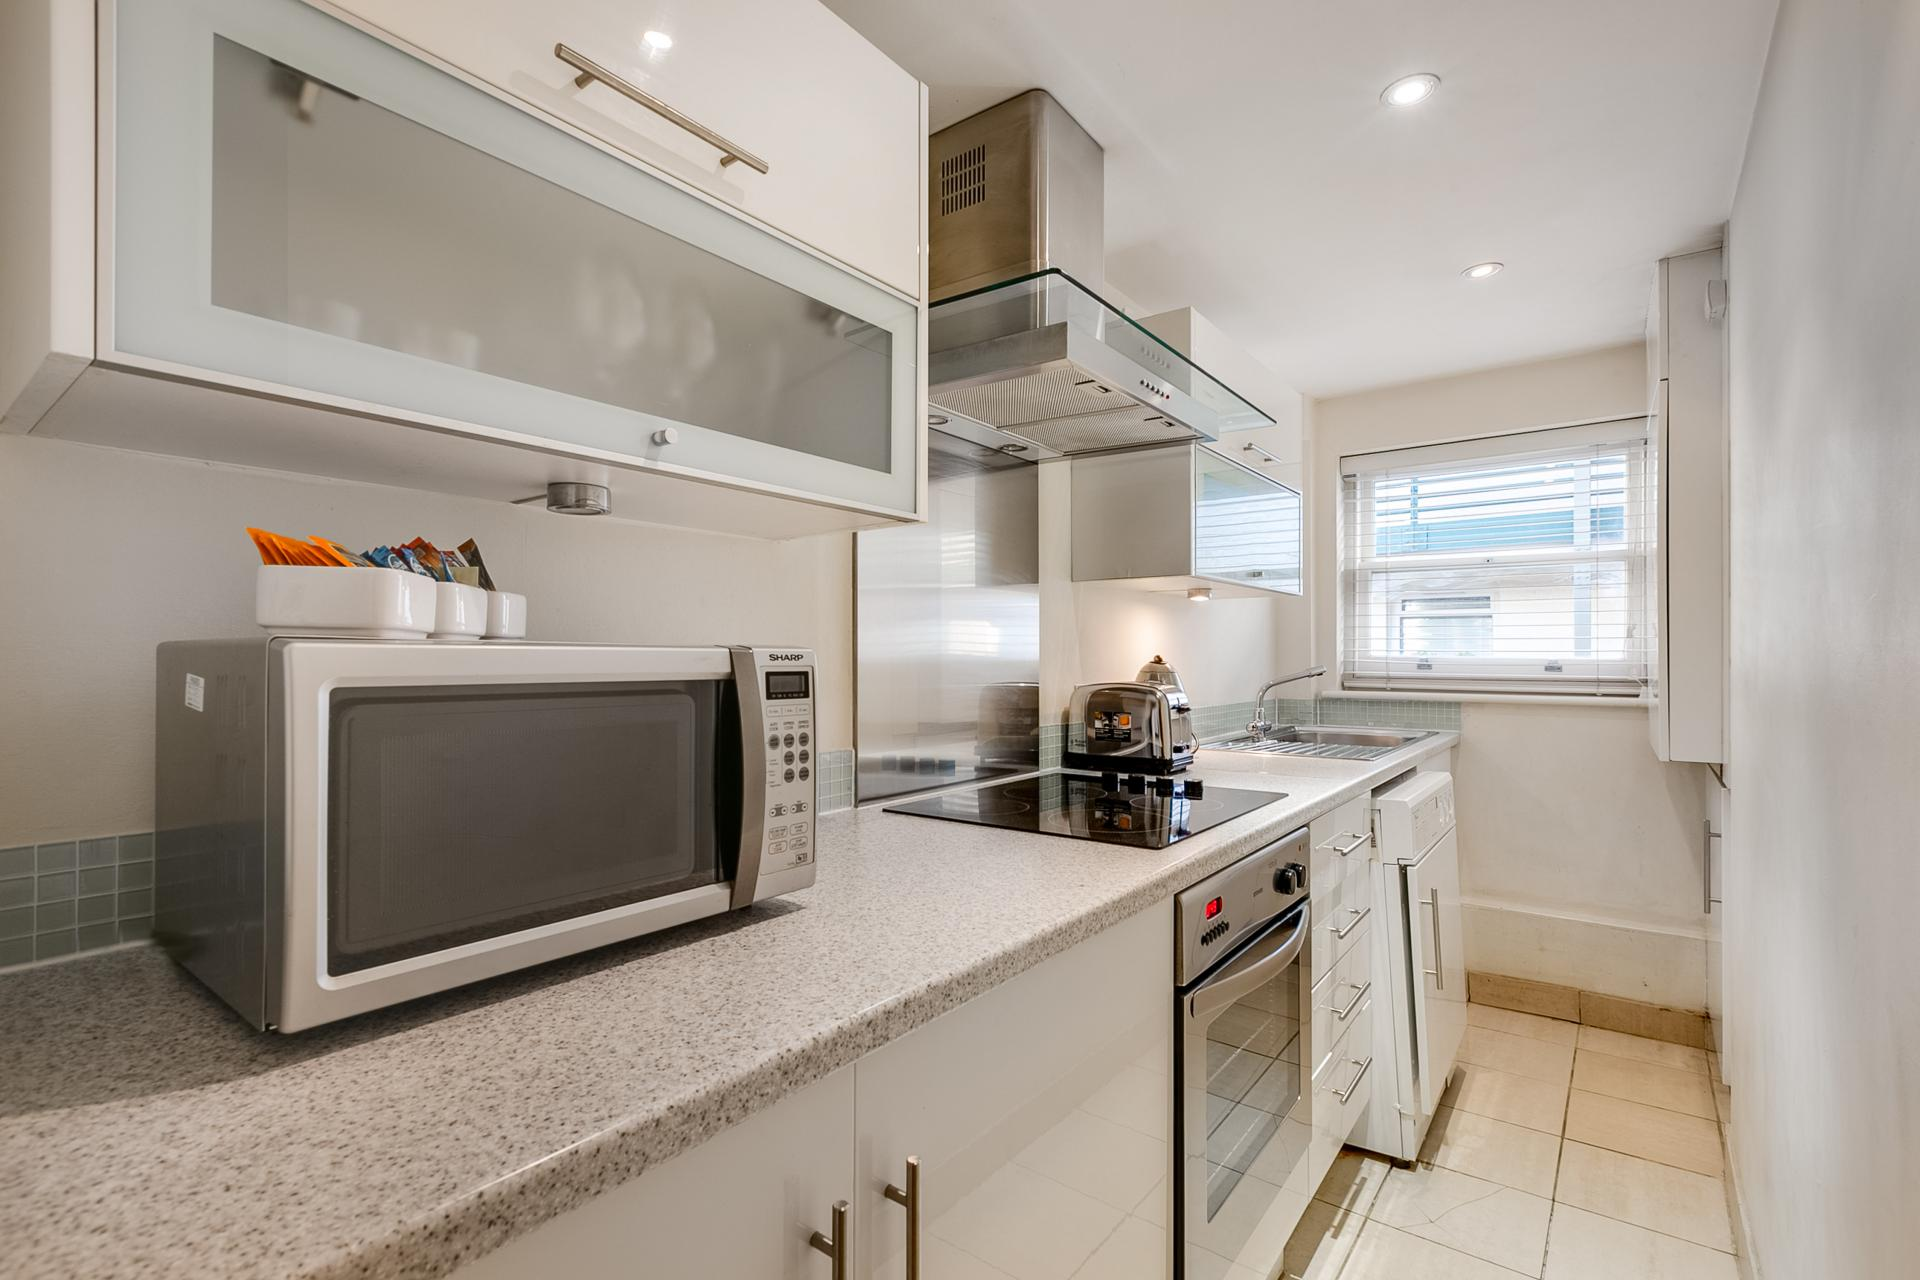 Kitchen at 54 James Street Apartment - Citybase Apartments